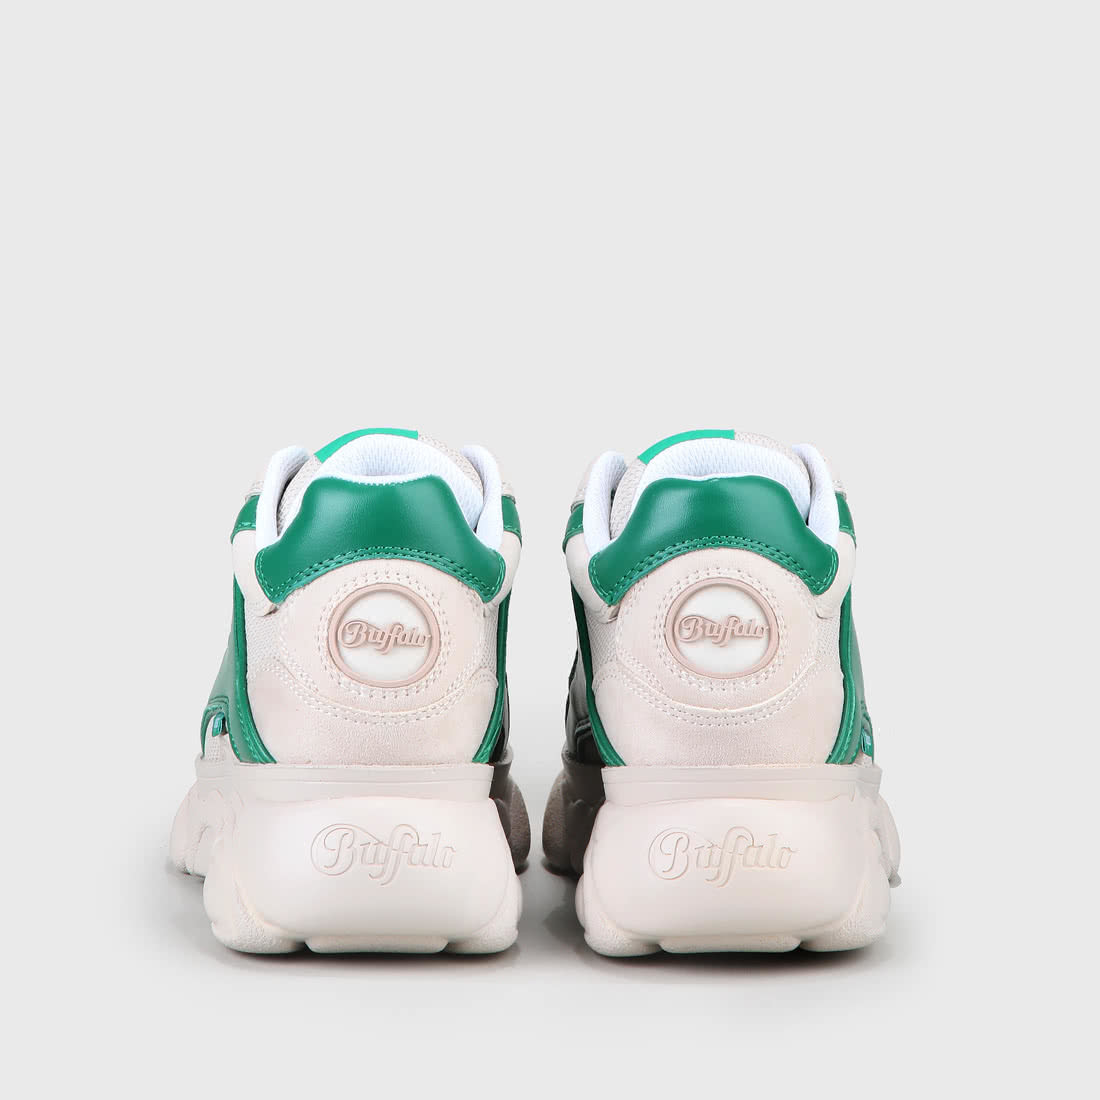 357a1e1f74b20e CLD Colby Sneaker aus Mesh und Lederoptik beige grün online kaufen ...